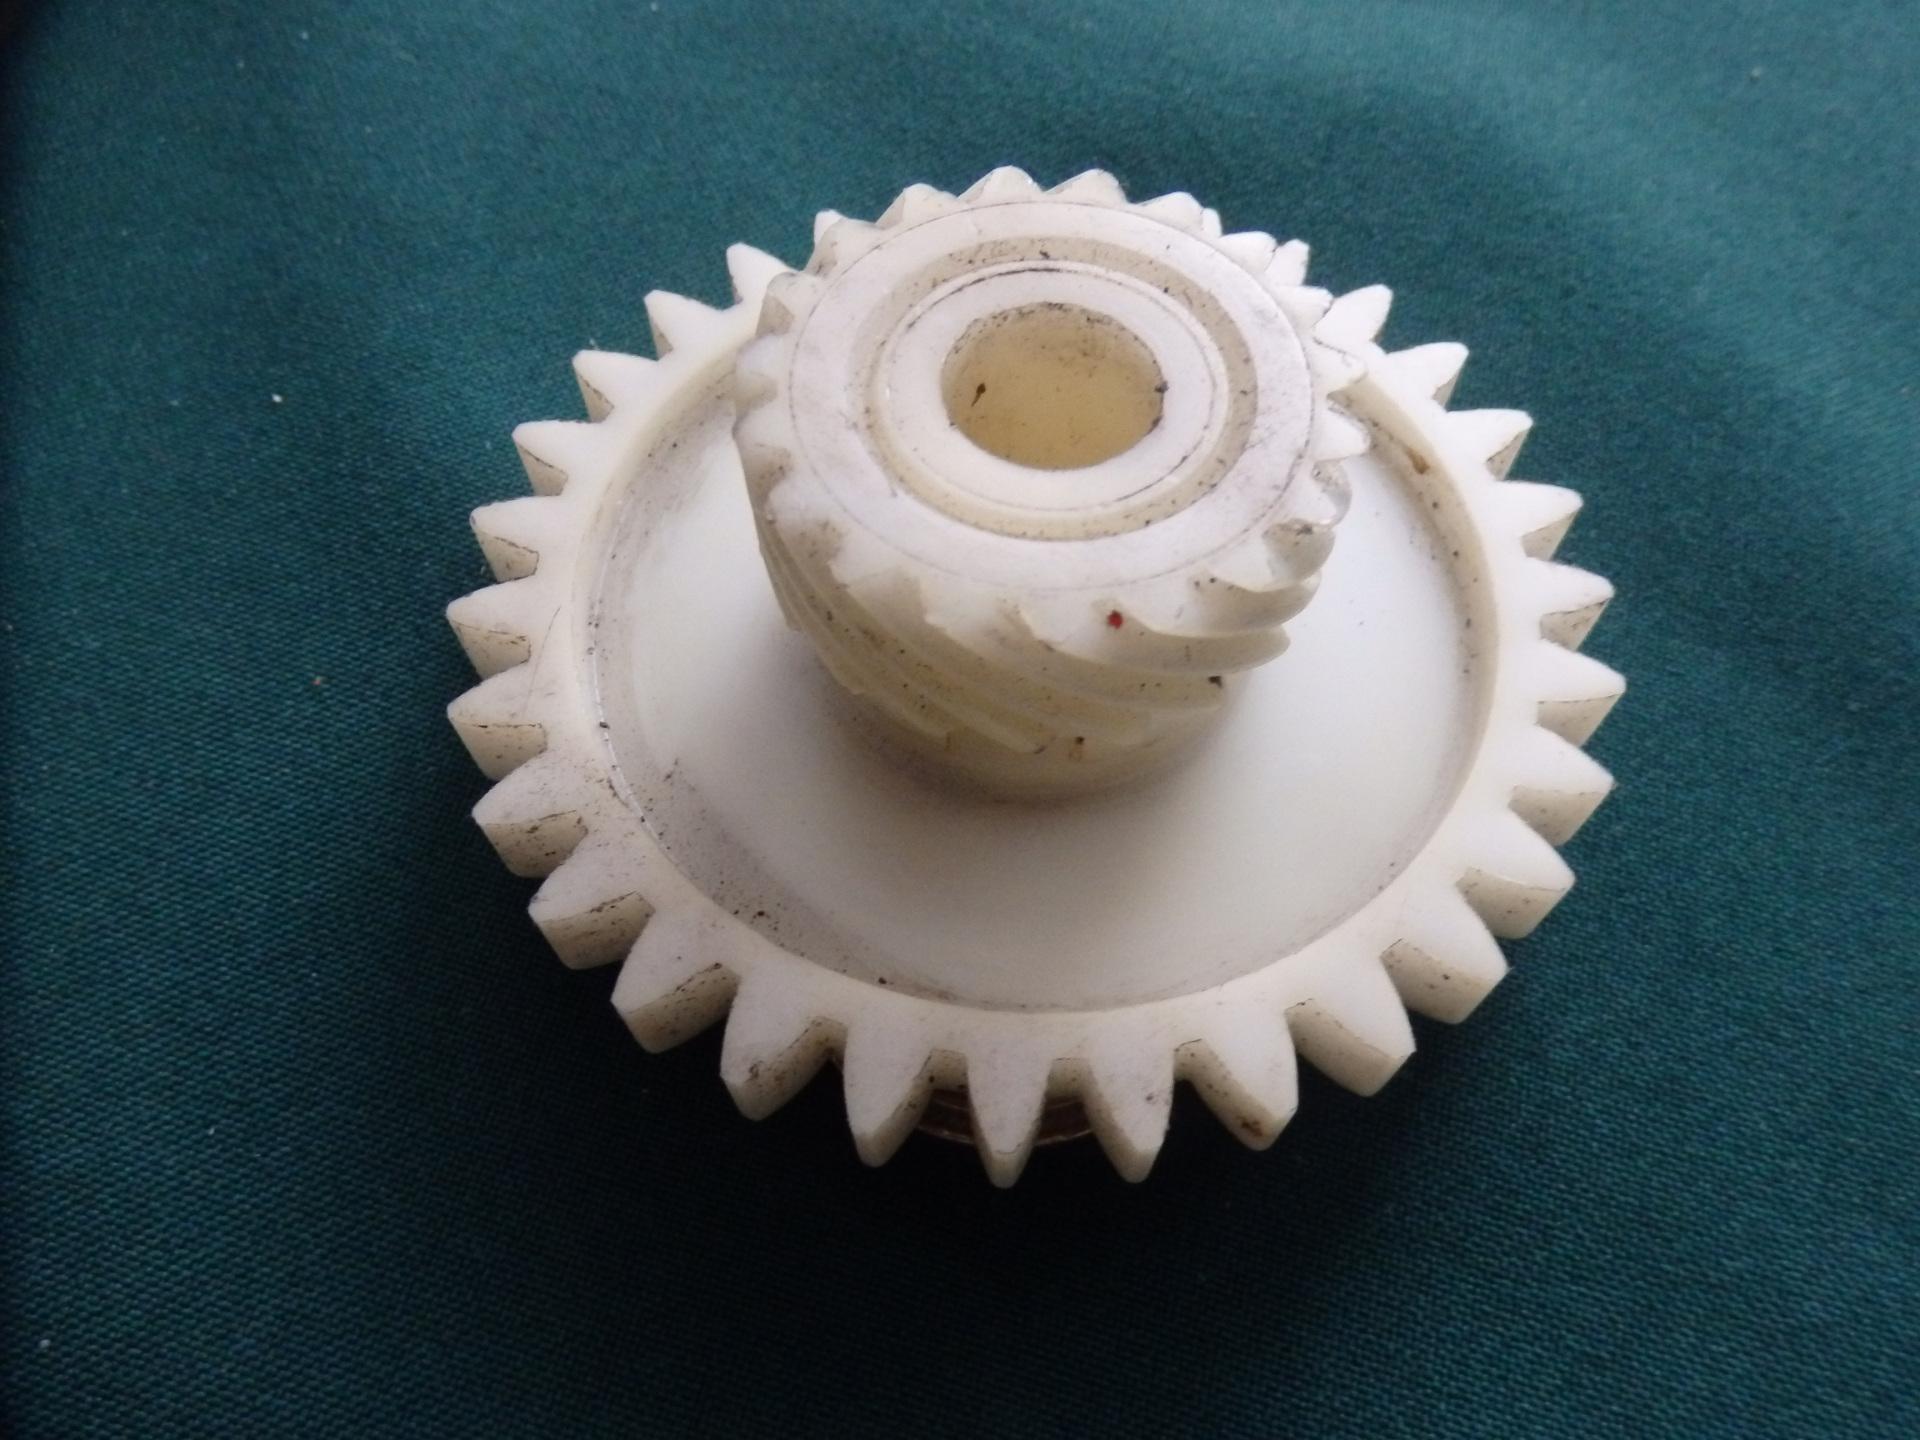 APRILIA AF1 Kilométer meghajto csiga fogaskerék 125 FUTURA - 5800 Ft